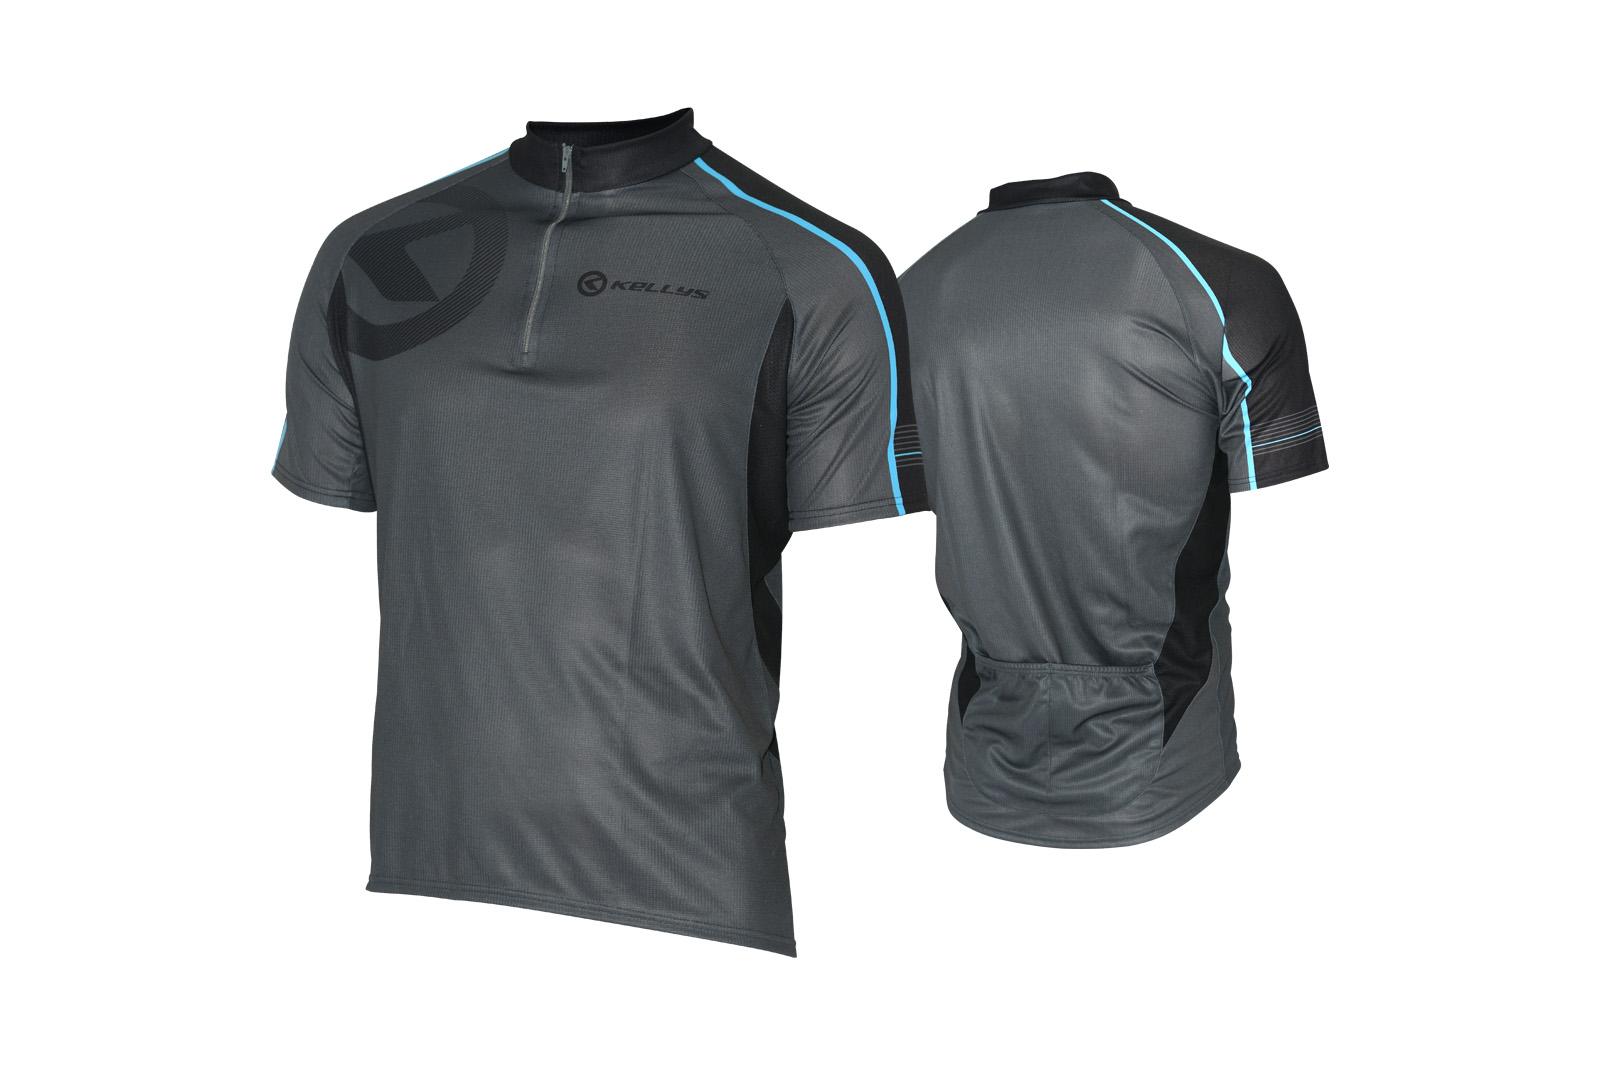 Pánský dres KELLYS PRO Sport, vel. L, šedo-modrá, krátký rukáv (Pánský cyklistický dres KELLYS, vel. L, krátký rukáv, barva šedá/modrá dle vyobrazení!)